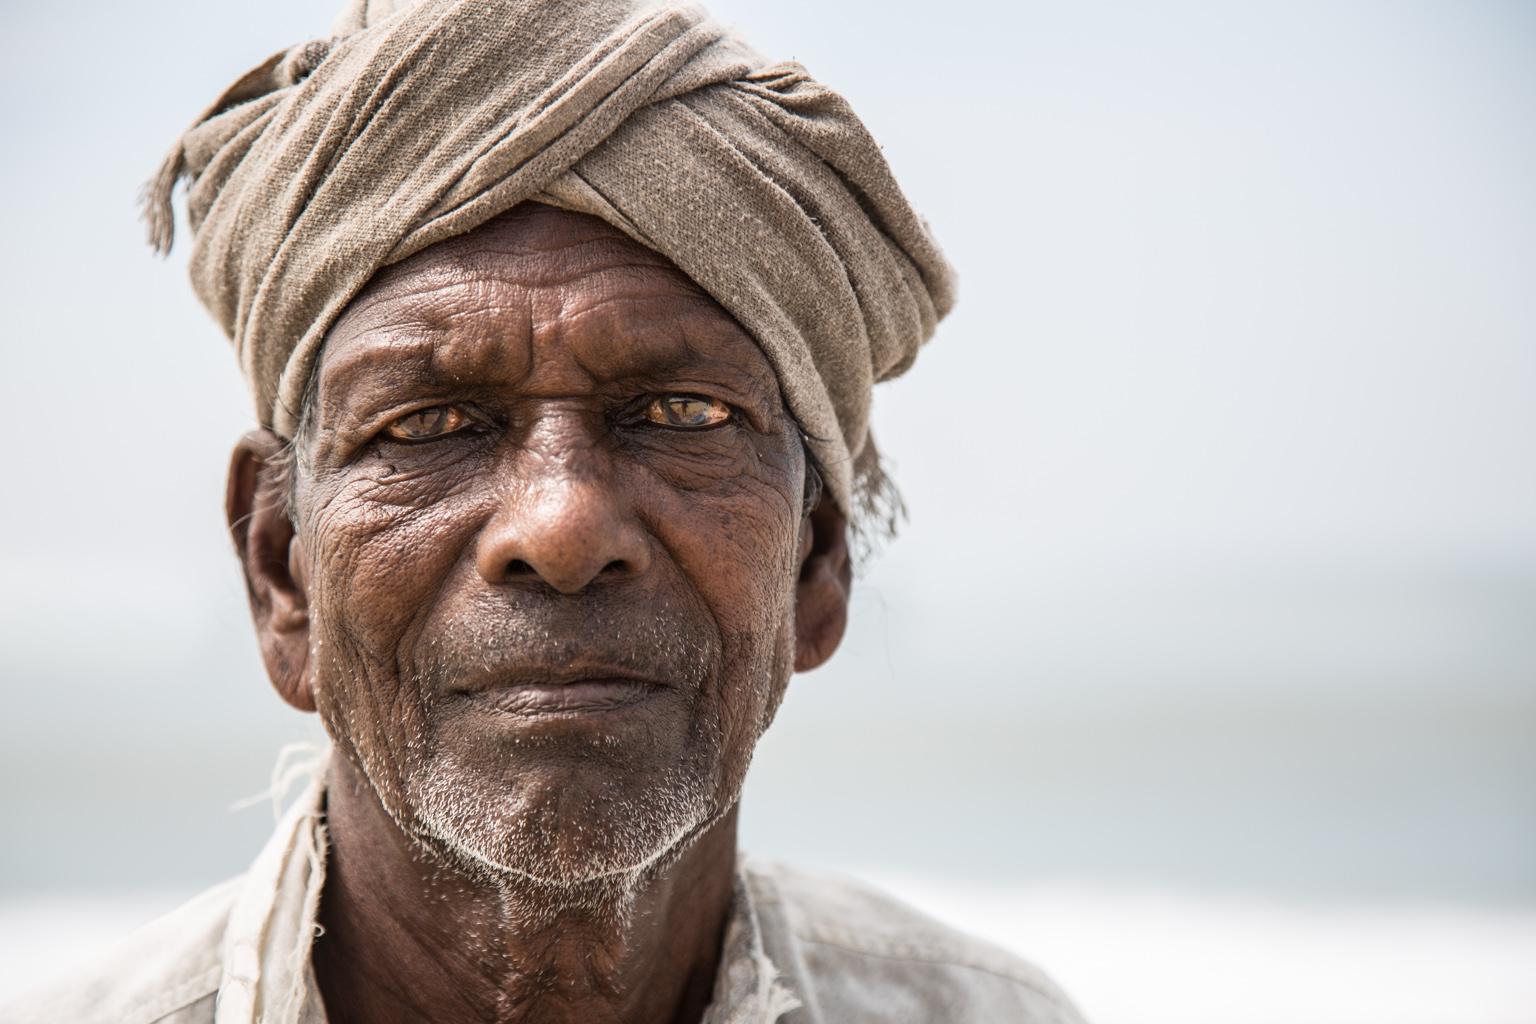 Matteo-Vegetti-blog-fishermen-of-Kerala-6944